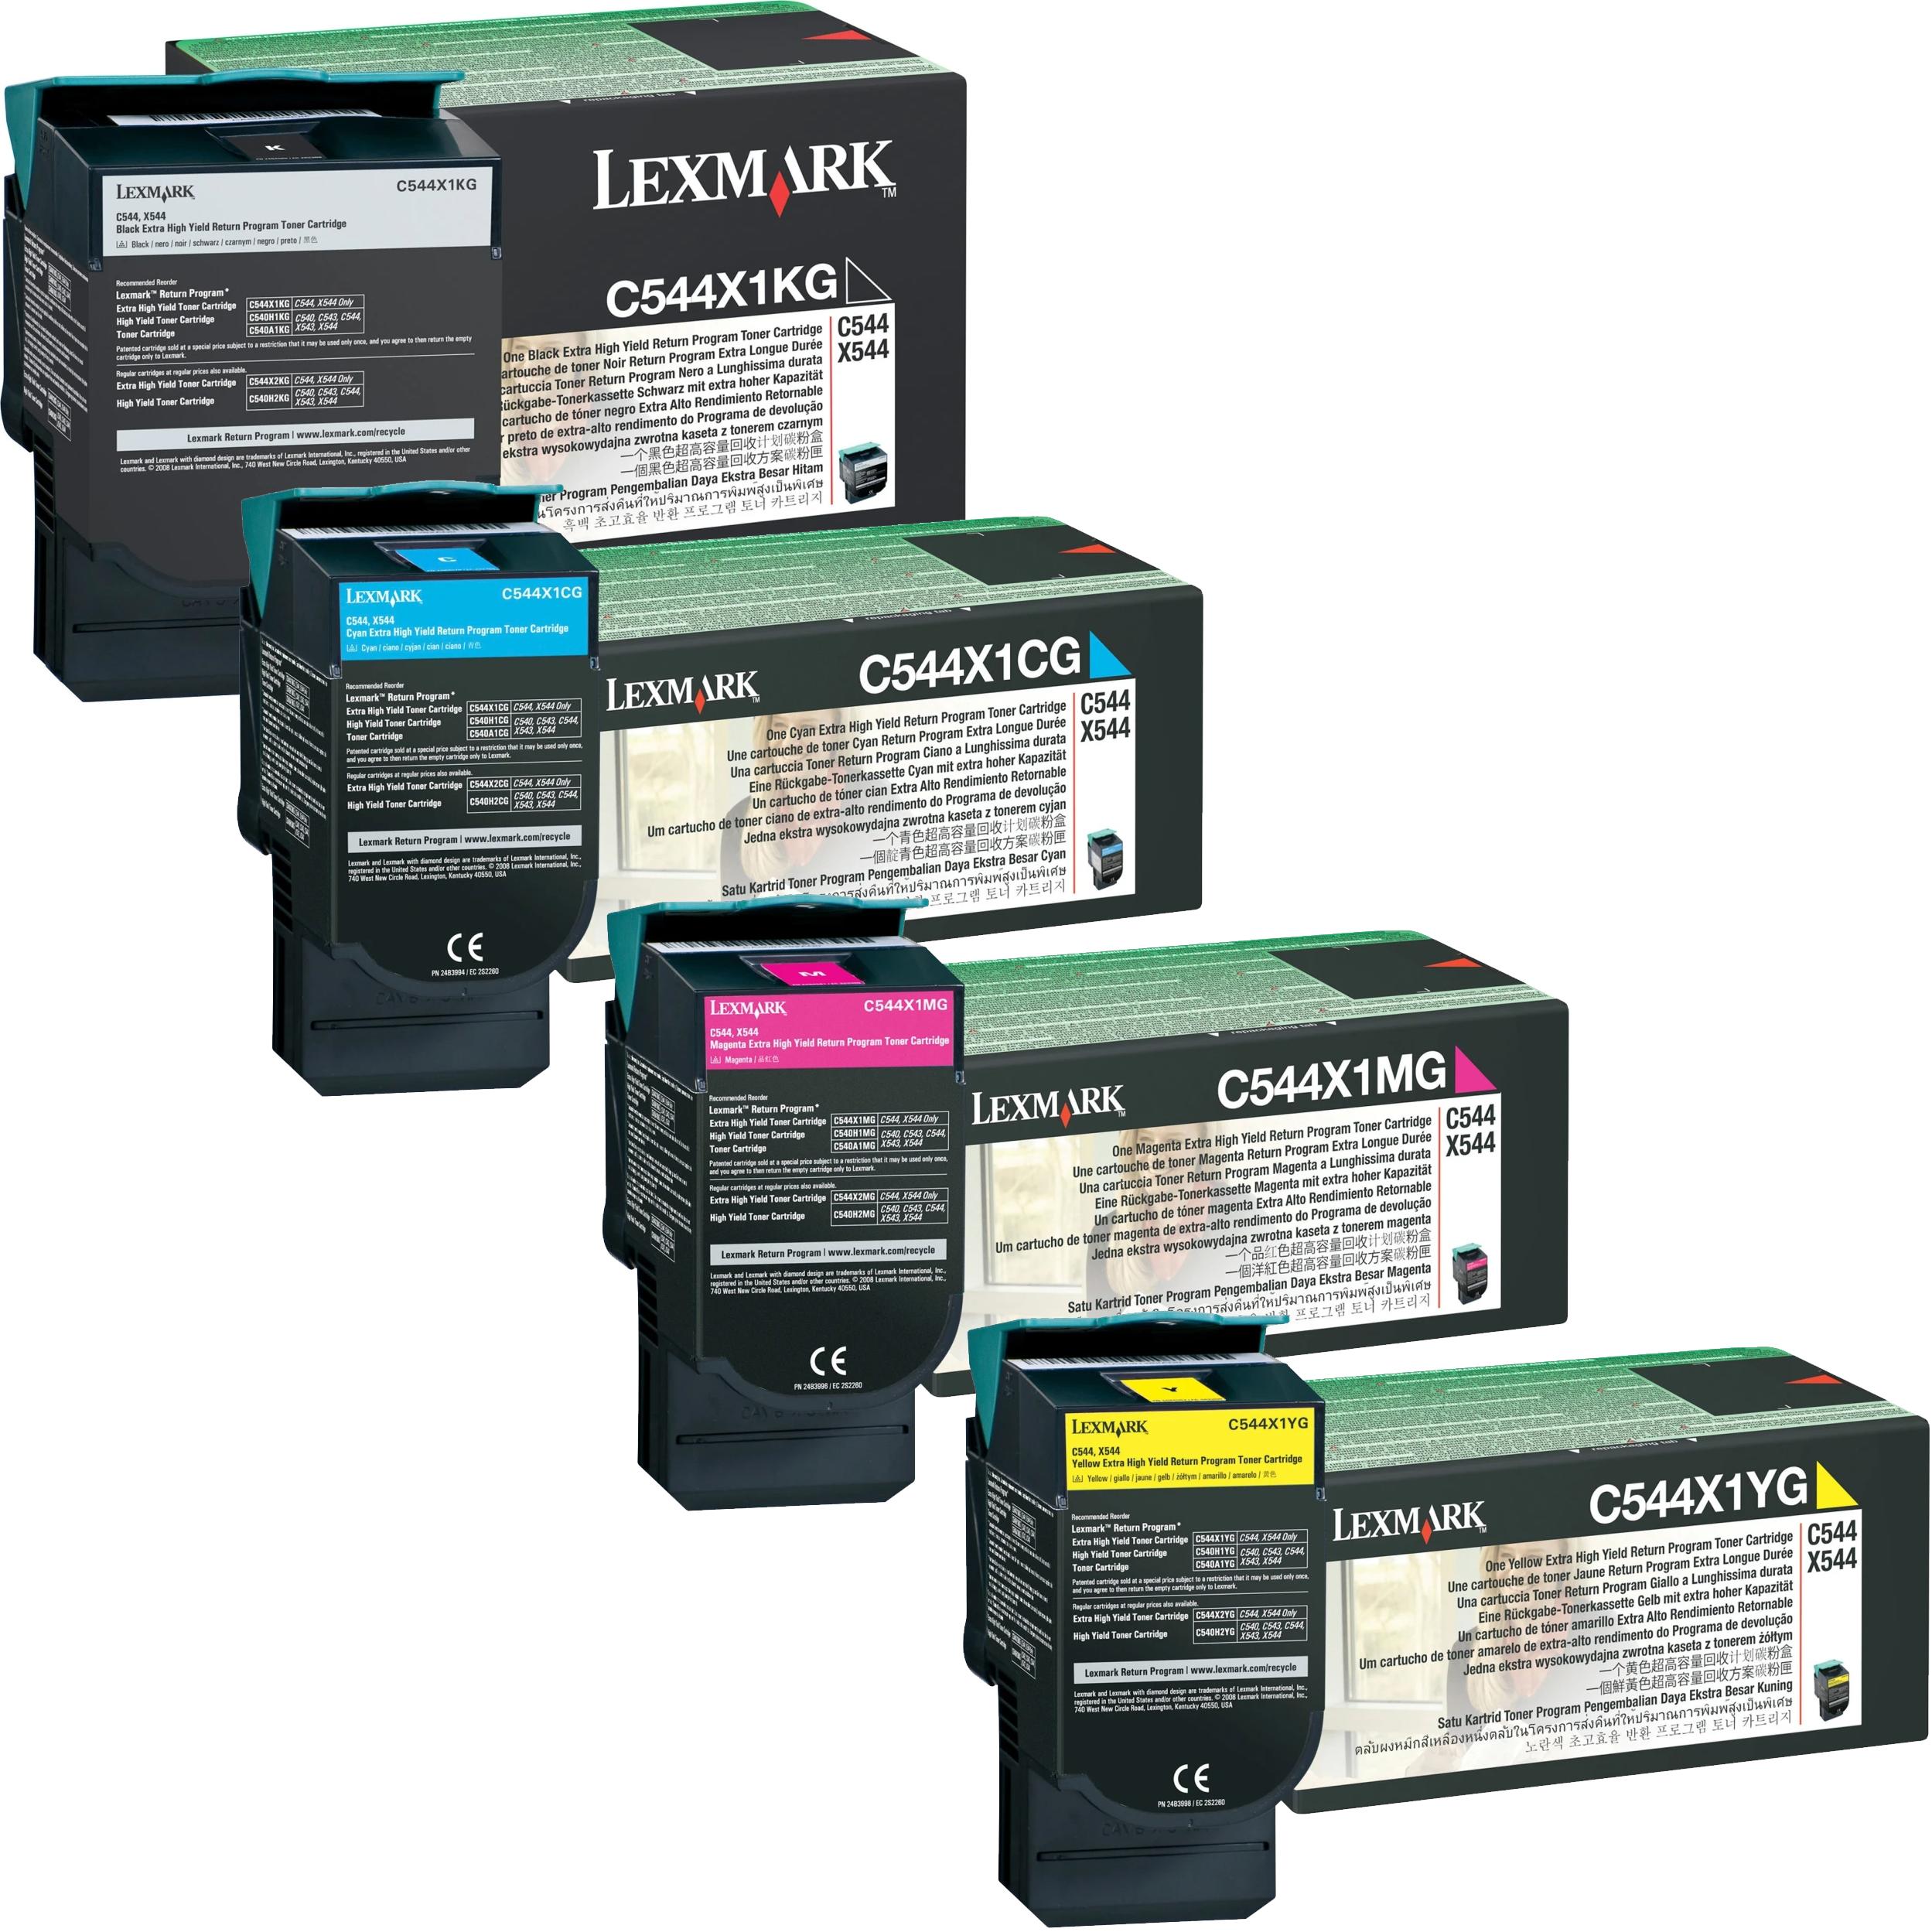 Lexmark C544X1 Set | C540H4CG C540H4KCG C540H4MG C540H4YG | Original Lexmark Extra High-Yield Toner Cartridges – Black, Cyan, Magenta, Yellow